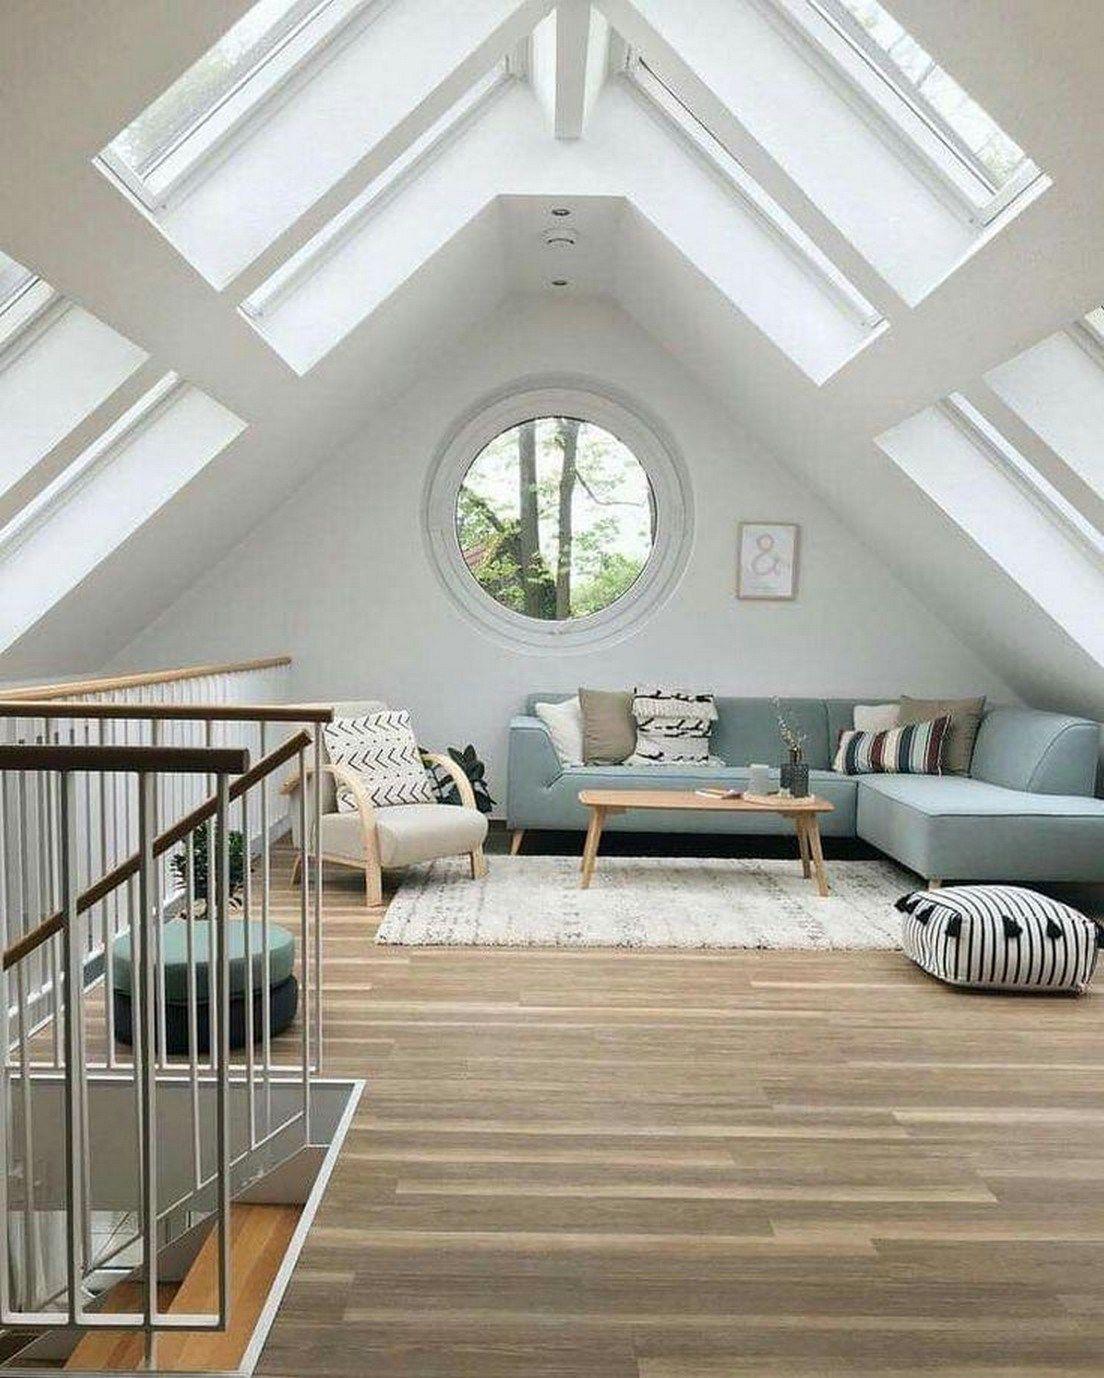 50 Cozy Simple Home Decorating Ideas For You 7 Fieltro Net Attic Bedroom Small Attic Bedroom Designs Loft Room